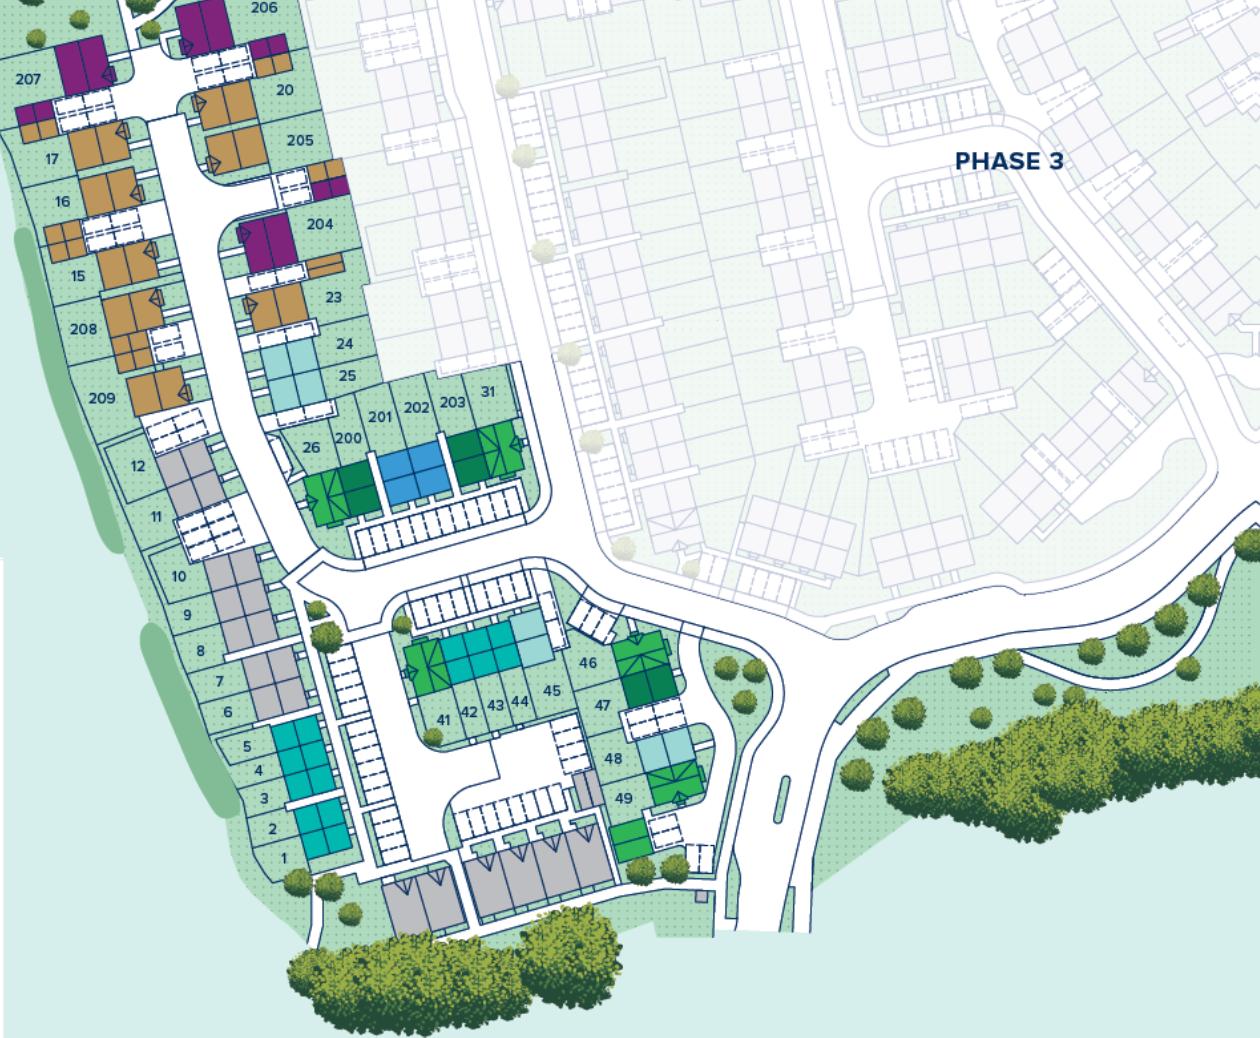 Mirum Park plan